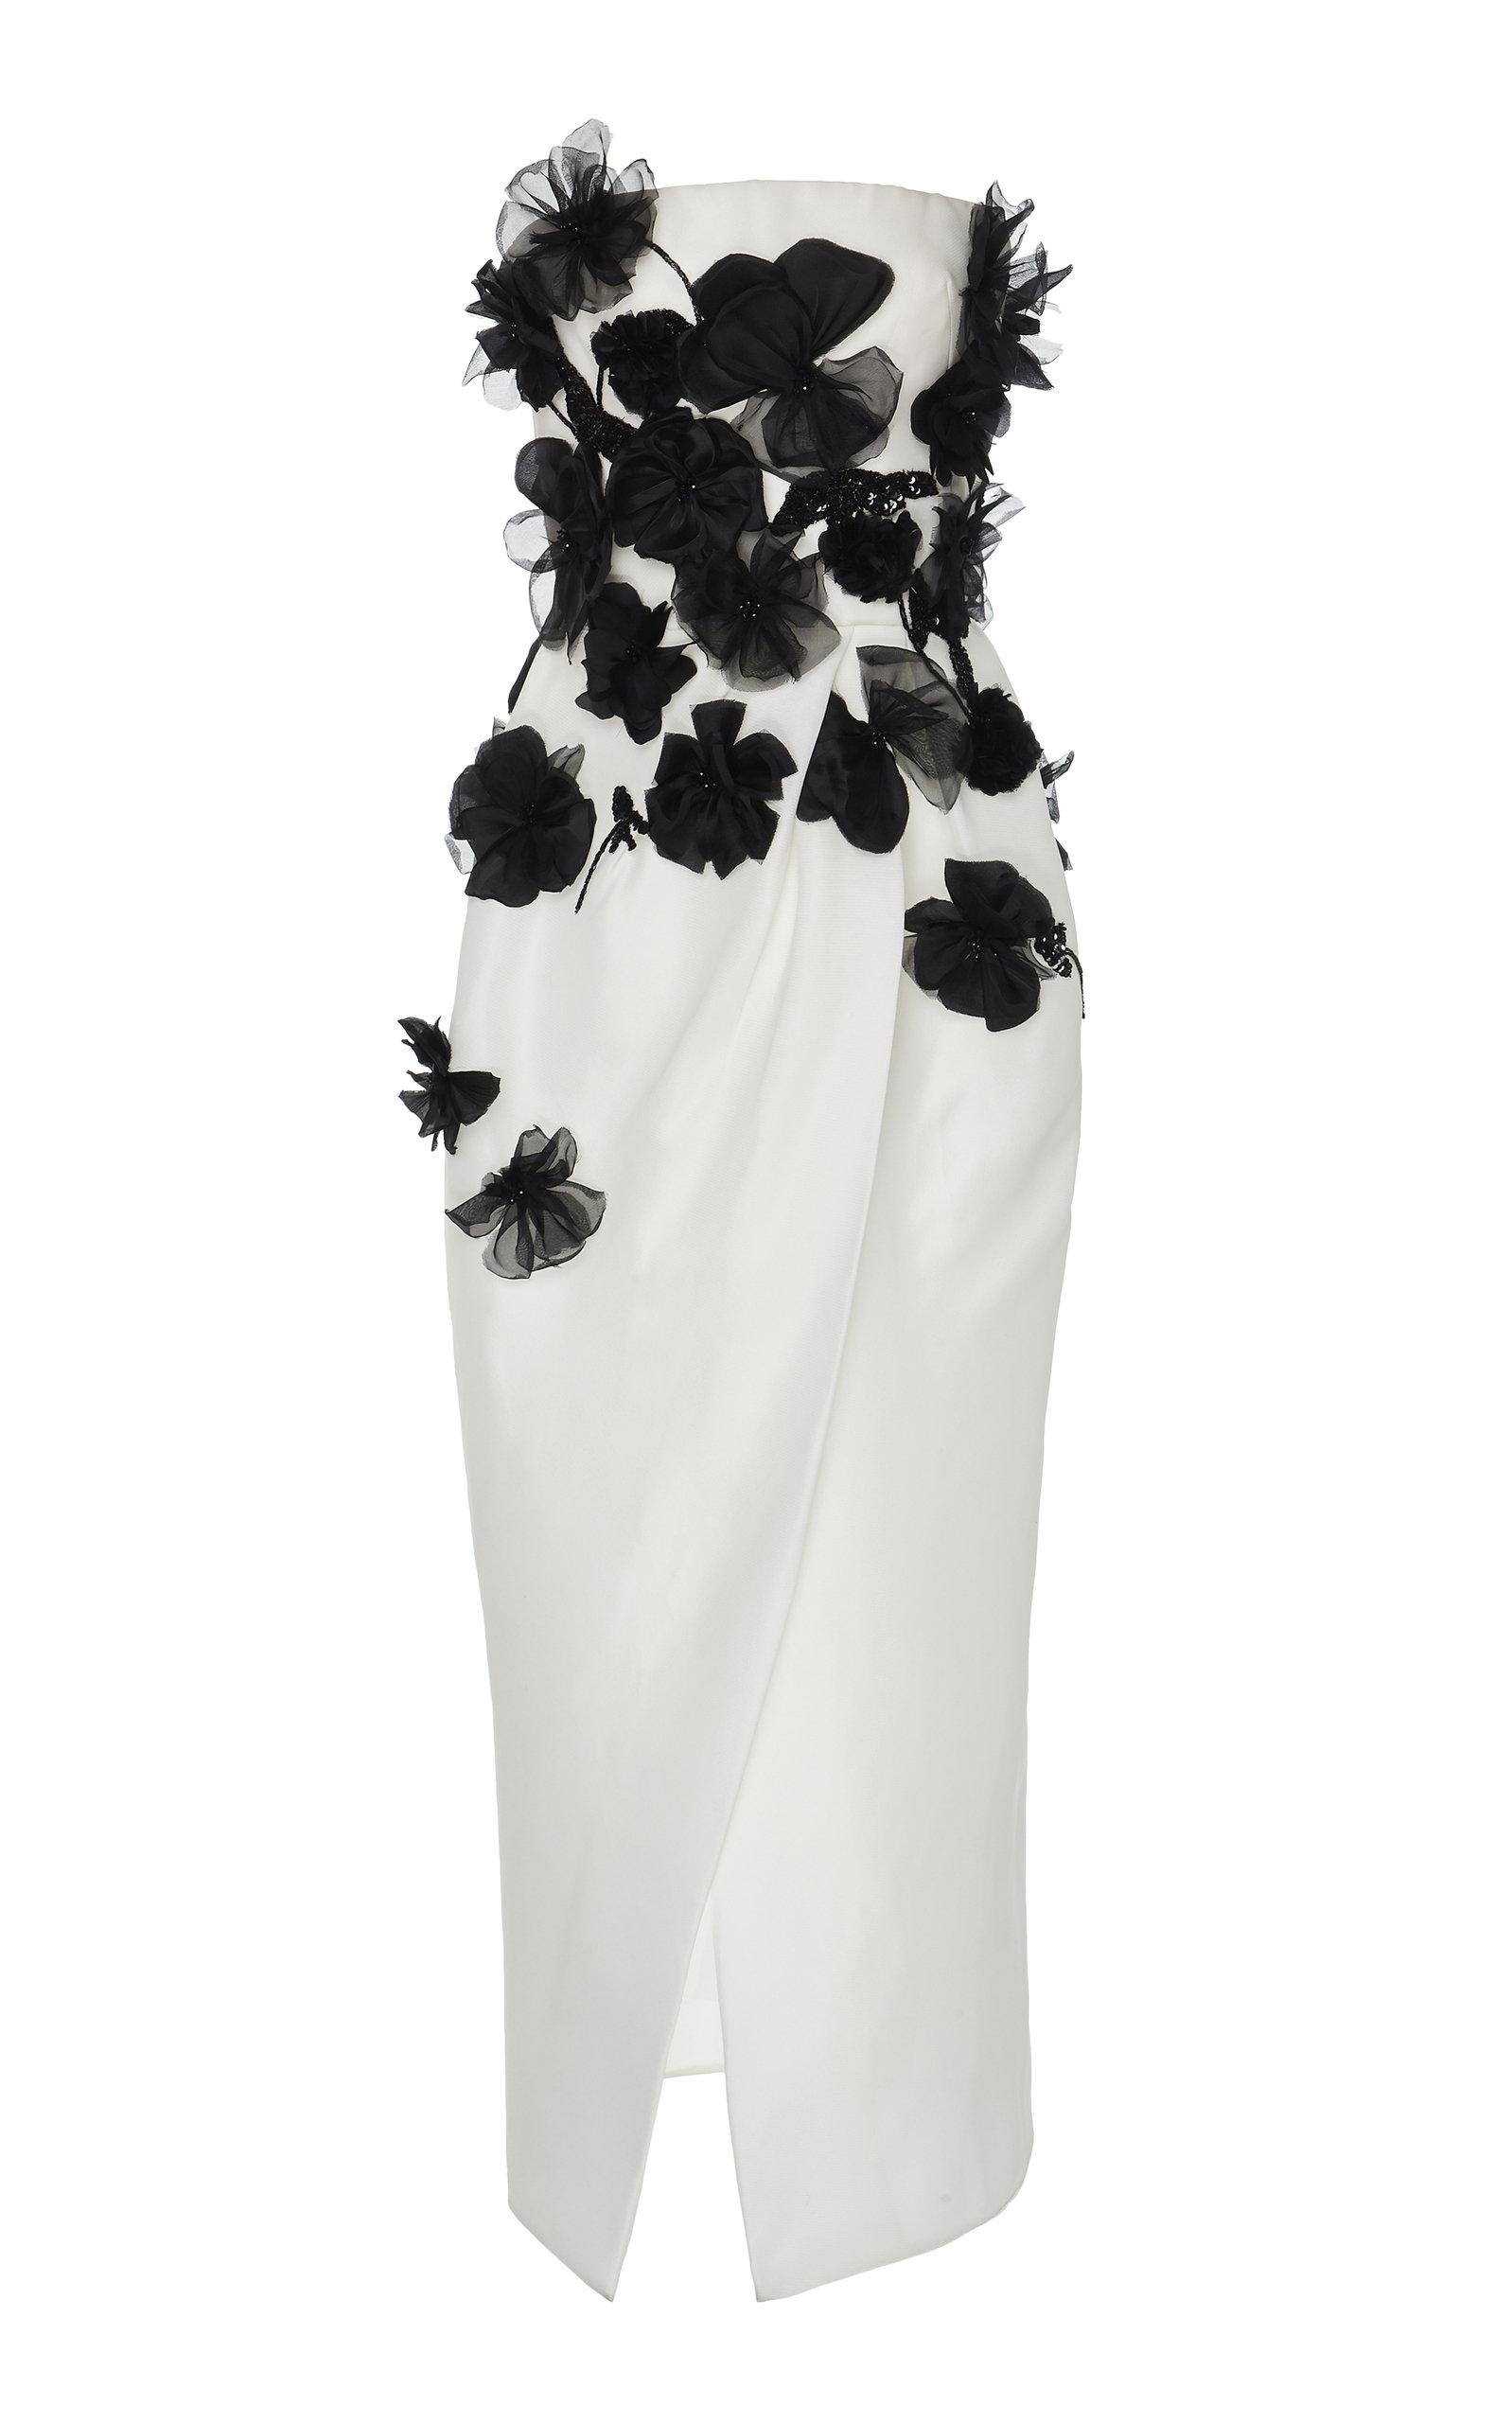 95e51d326351 Monique LhuillierStrapless Flower-Embellished Silk Midi Dress. CLOSE.  Loading